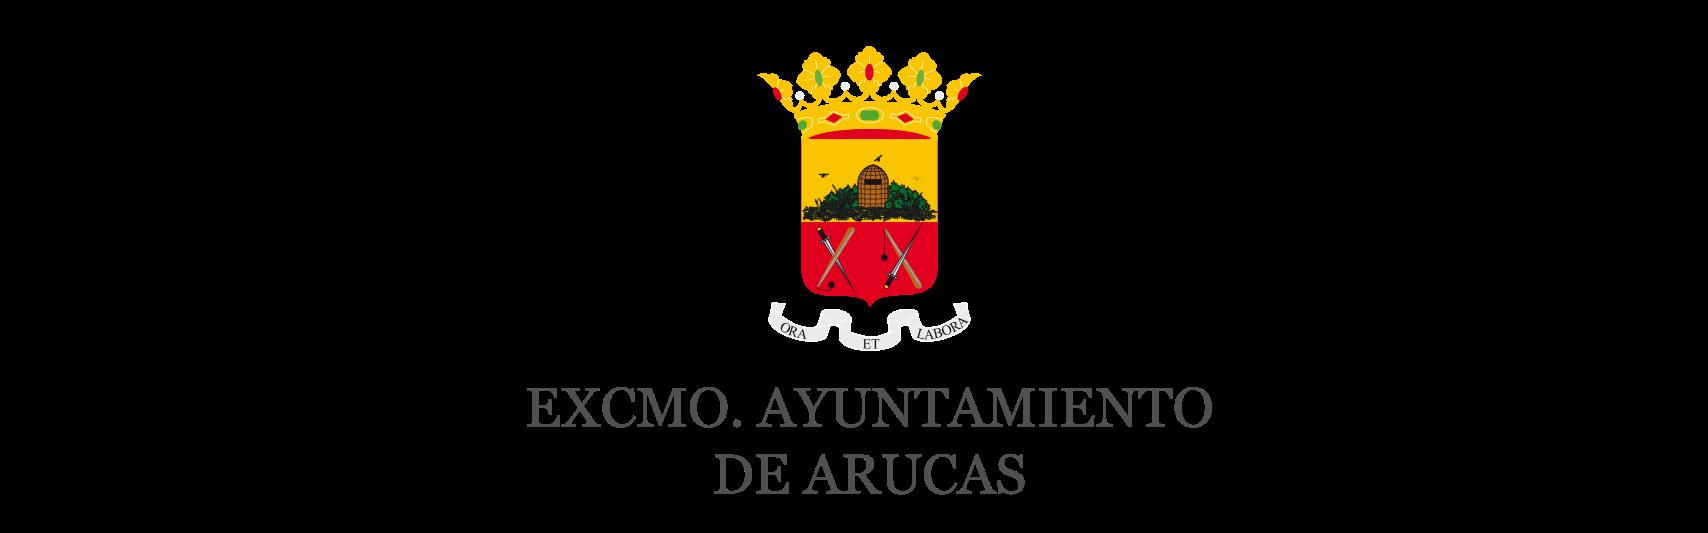 logo ARUCAS htal web - GCOM 2020